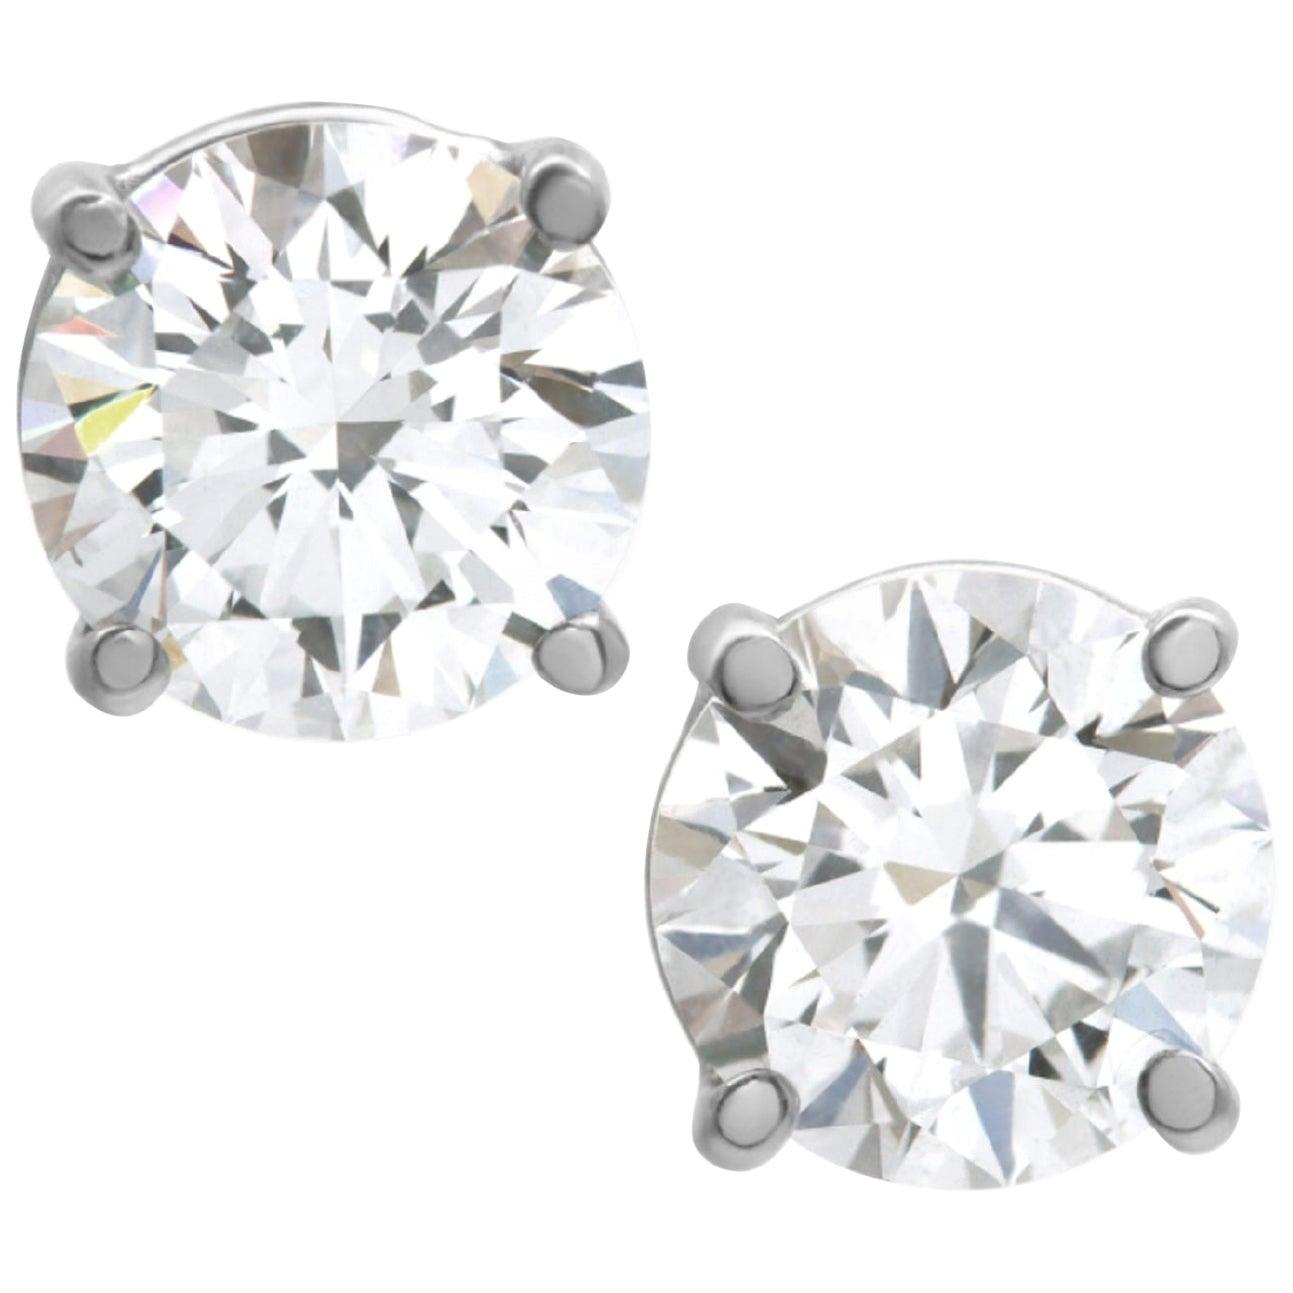 Internally Flawless D Color GIA Certified 3.12 Carat Diamond Studs